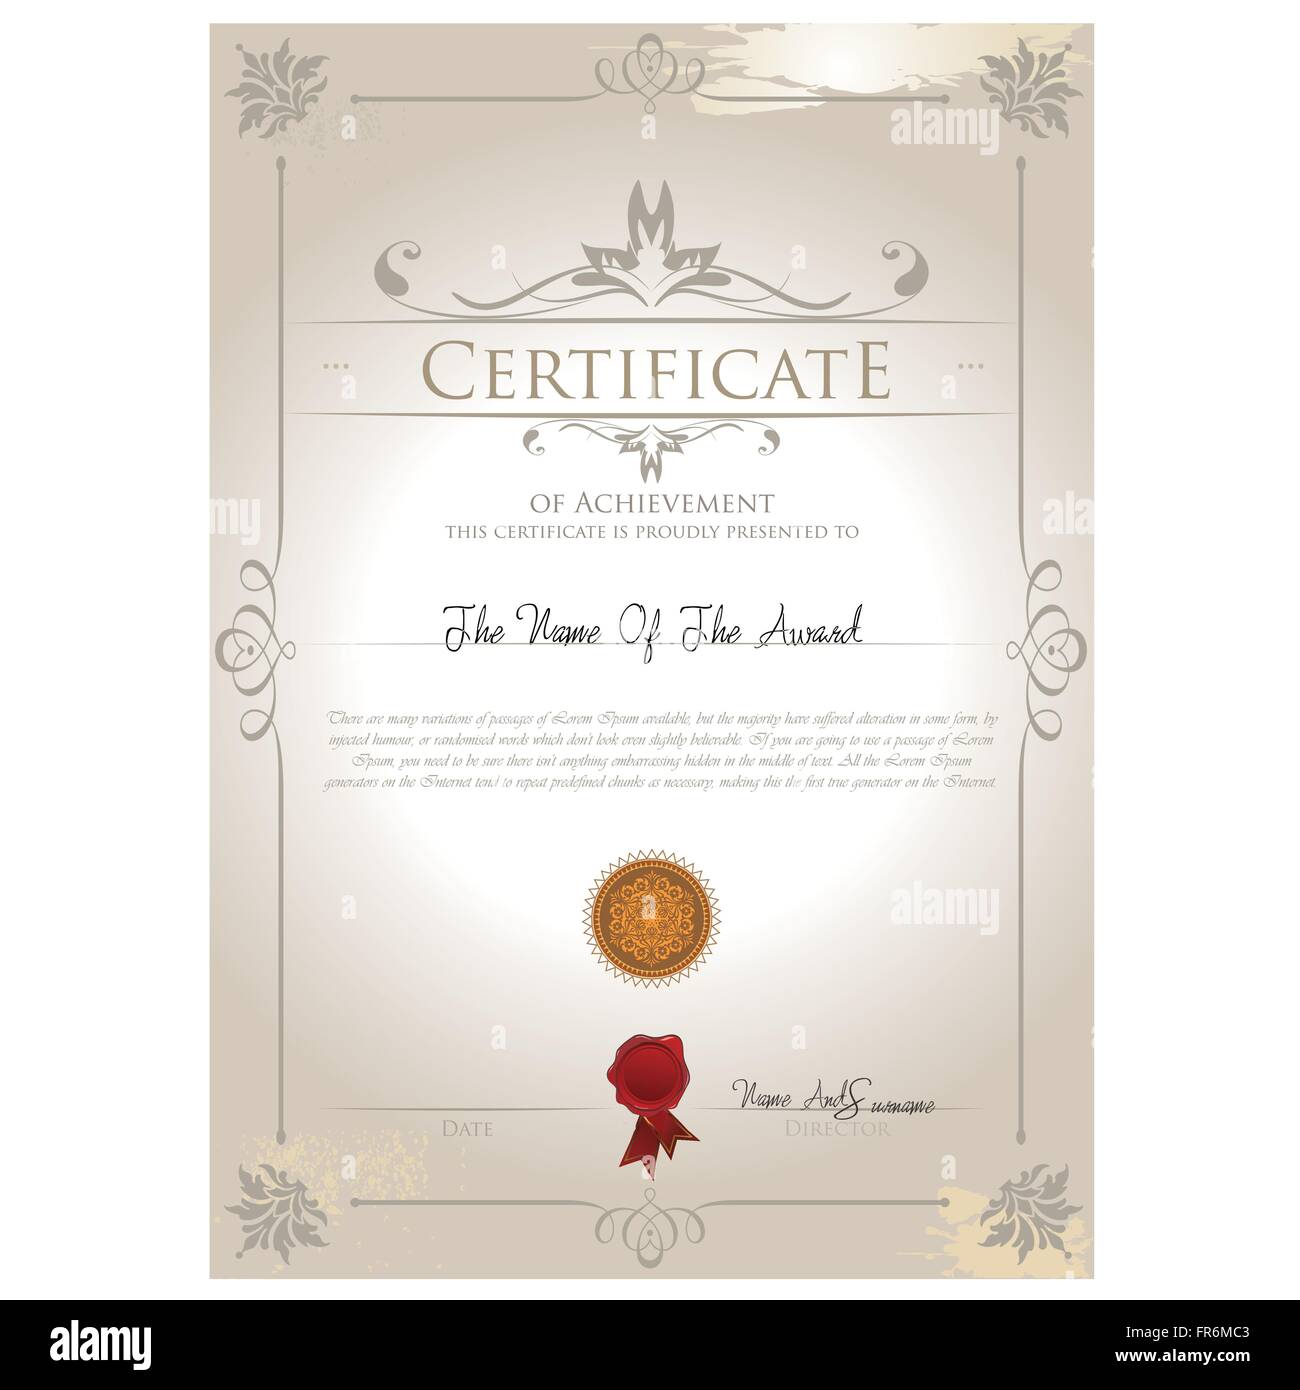 Antique Stock Certificate Stockfotos & Antique Stock Certificate ...